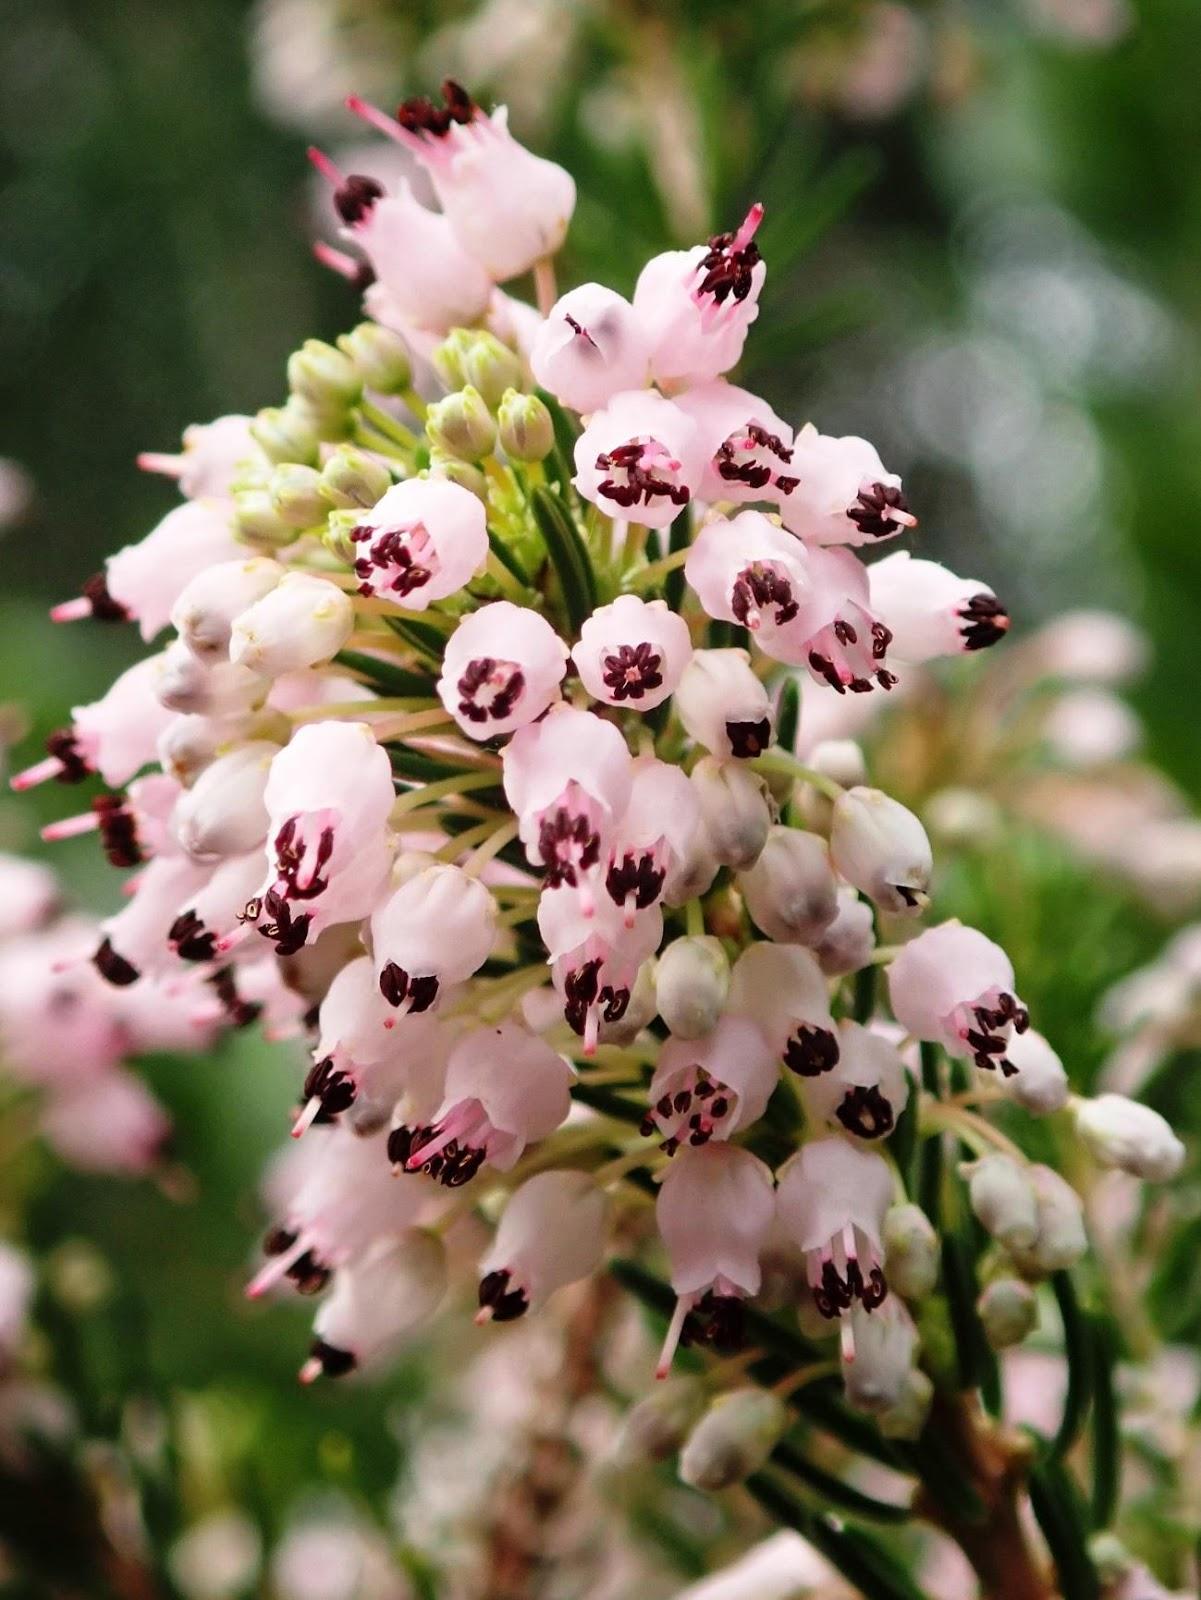 C:\Users\User\Pictures\Tardor a Alcanada\04 11 2020\flor de xiprell m.jpg